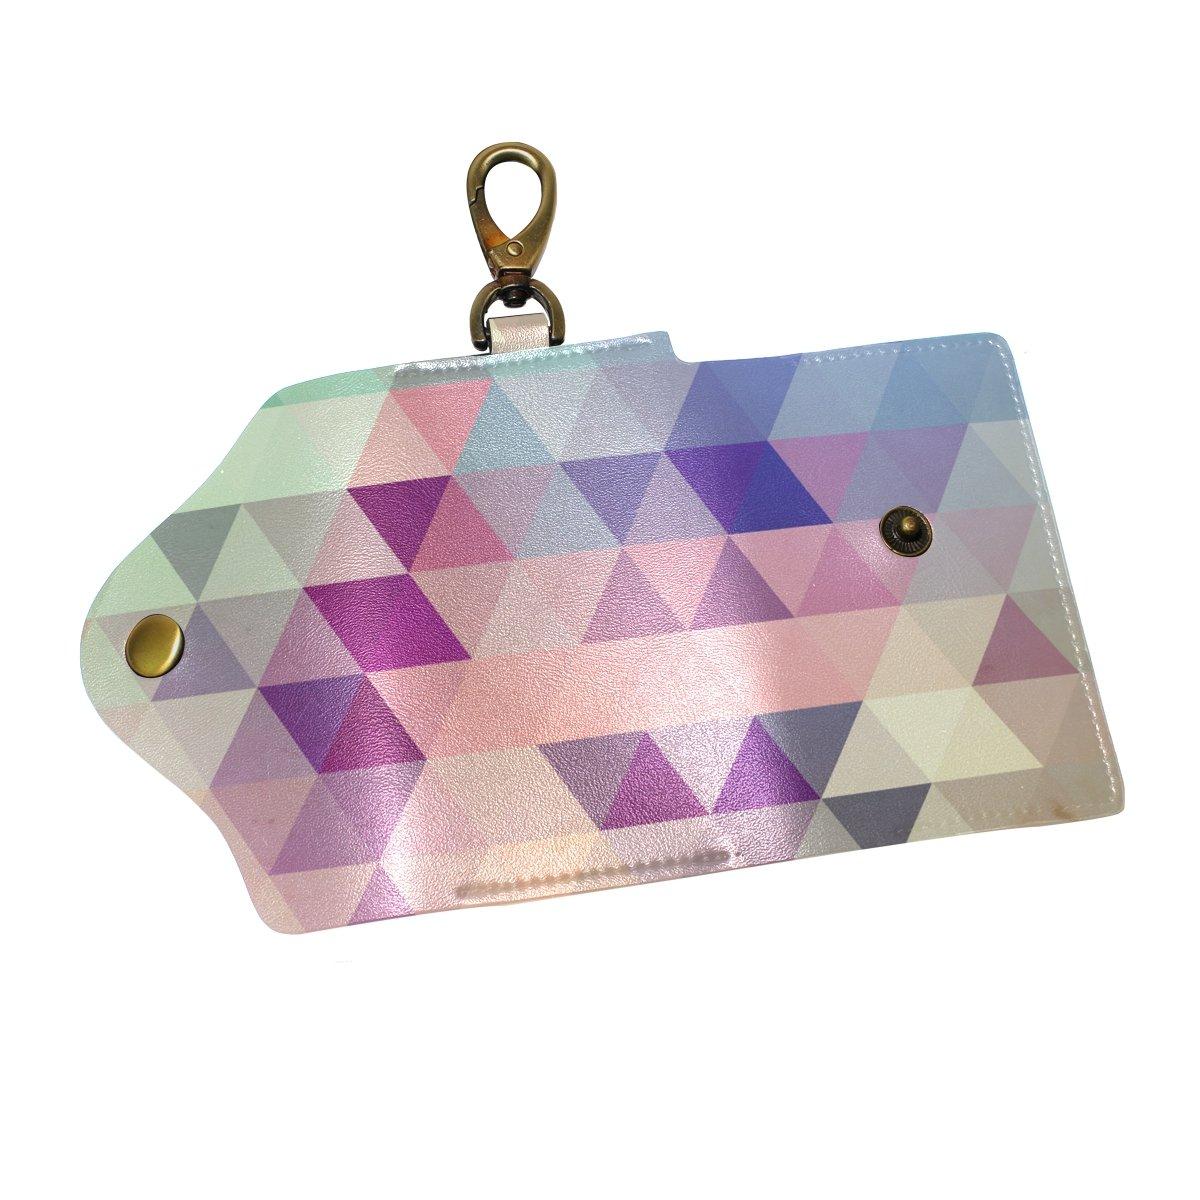 DEYYA Abstract Background Leather Key Case Wallets Unisex Keychain Key Holder with 6 Hooks Snap Closure